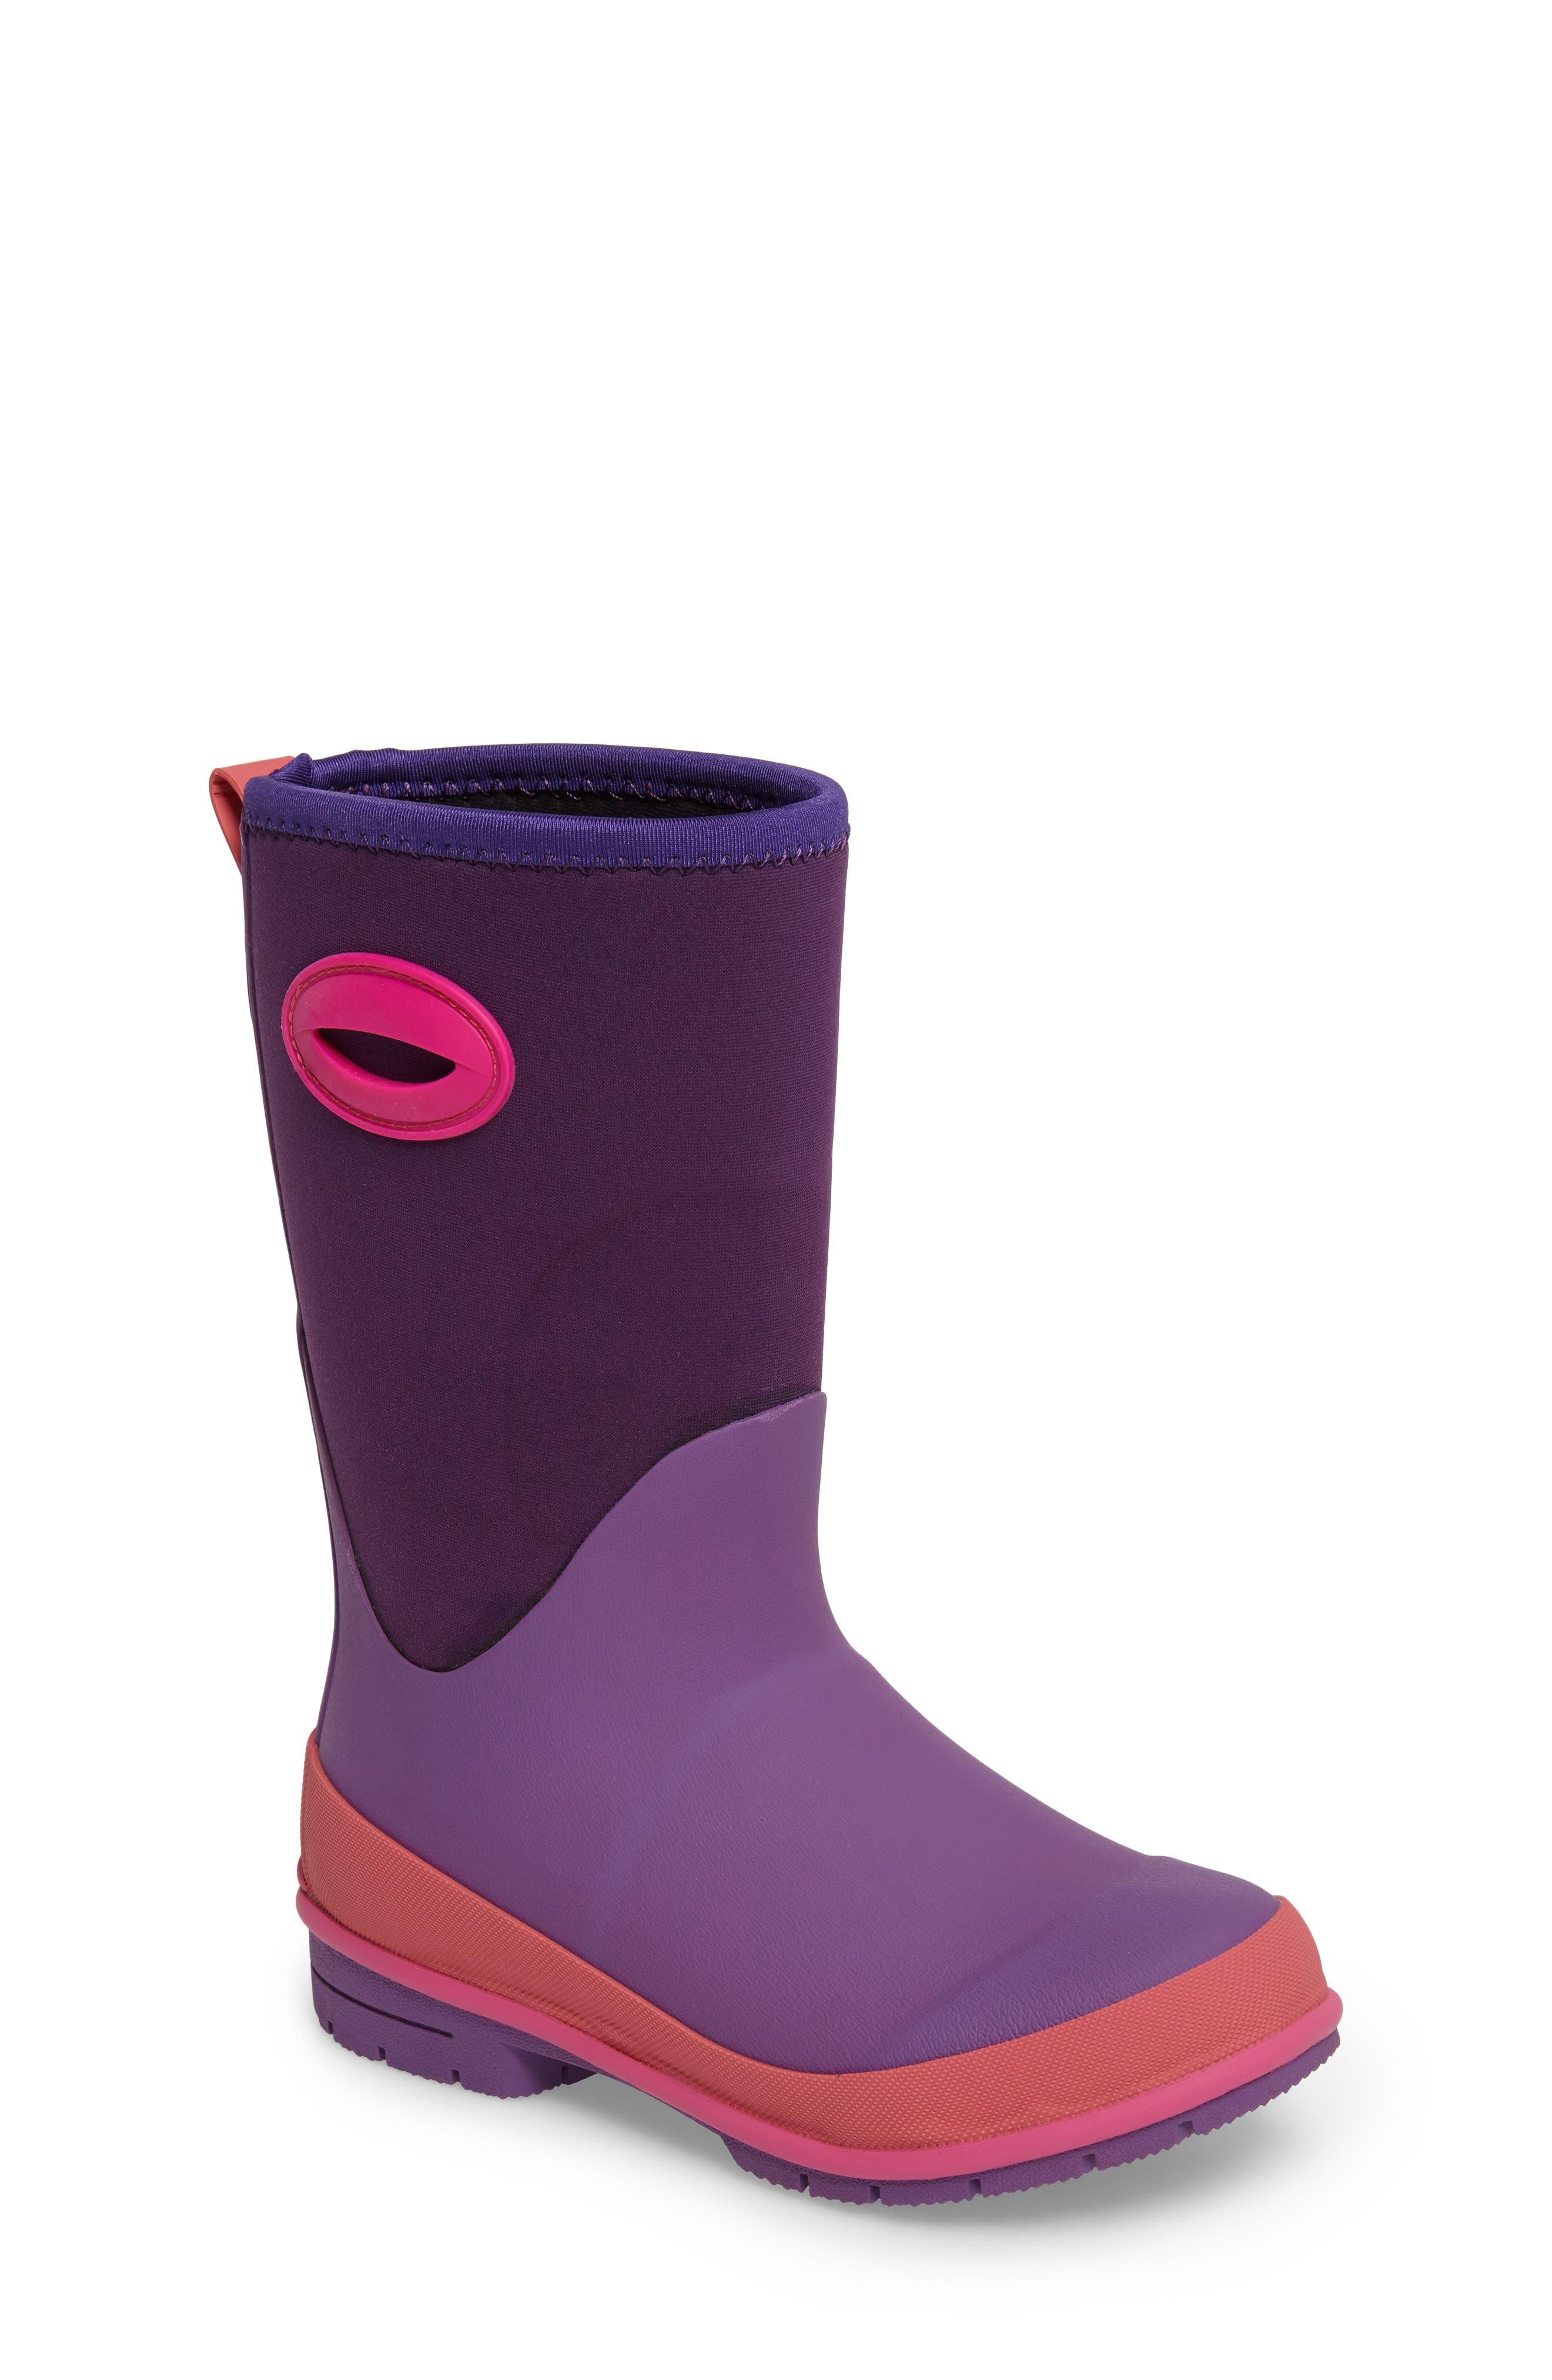 Neoprene Purple Snow Boot,                             Main thumbnail 1, color,                             Purple